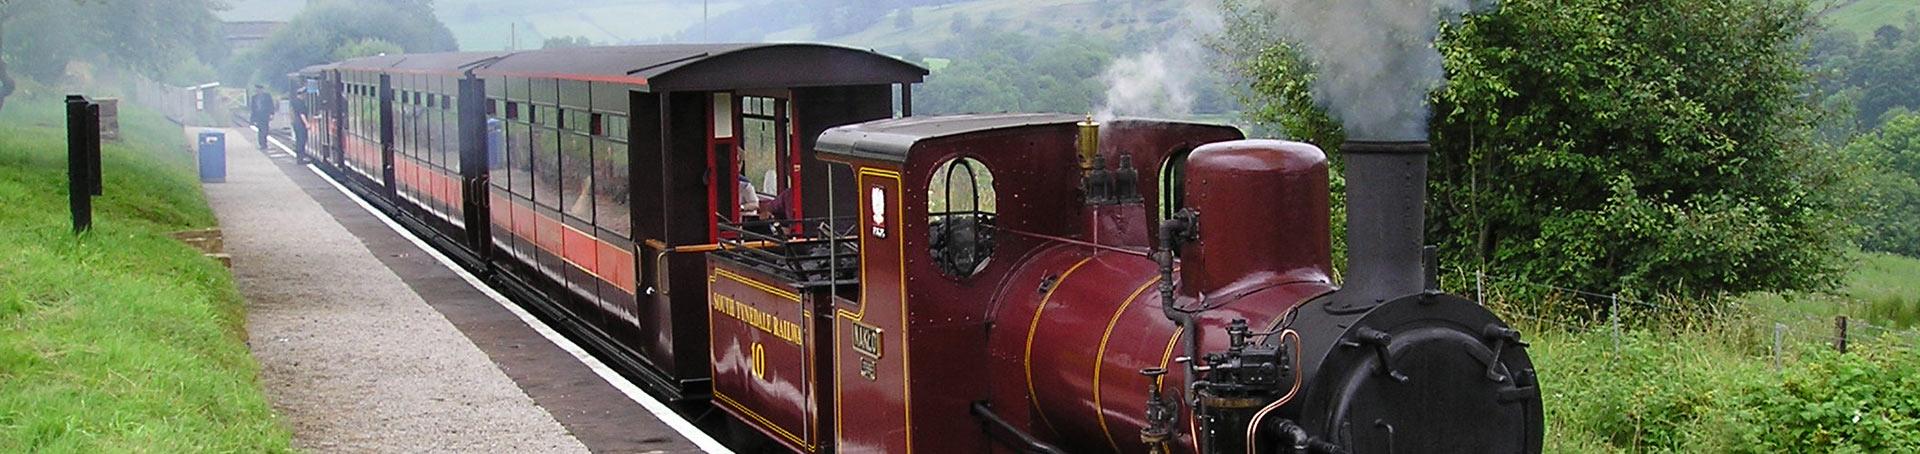 South Tyneside Railway